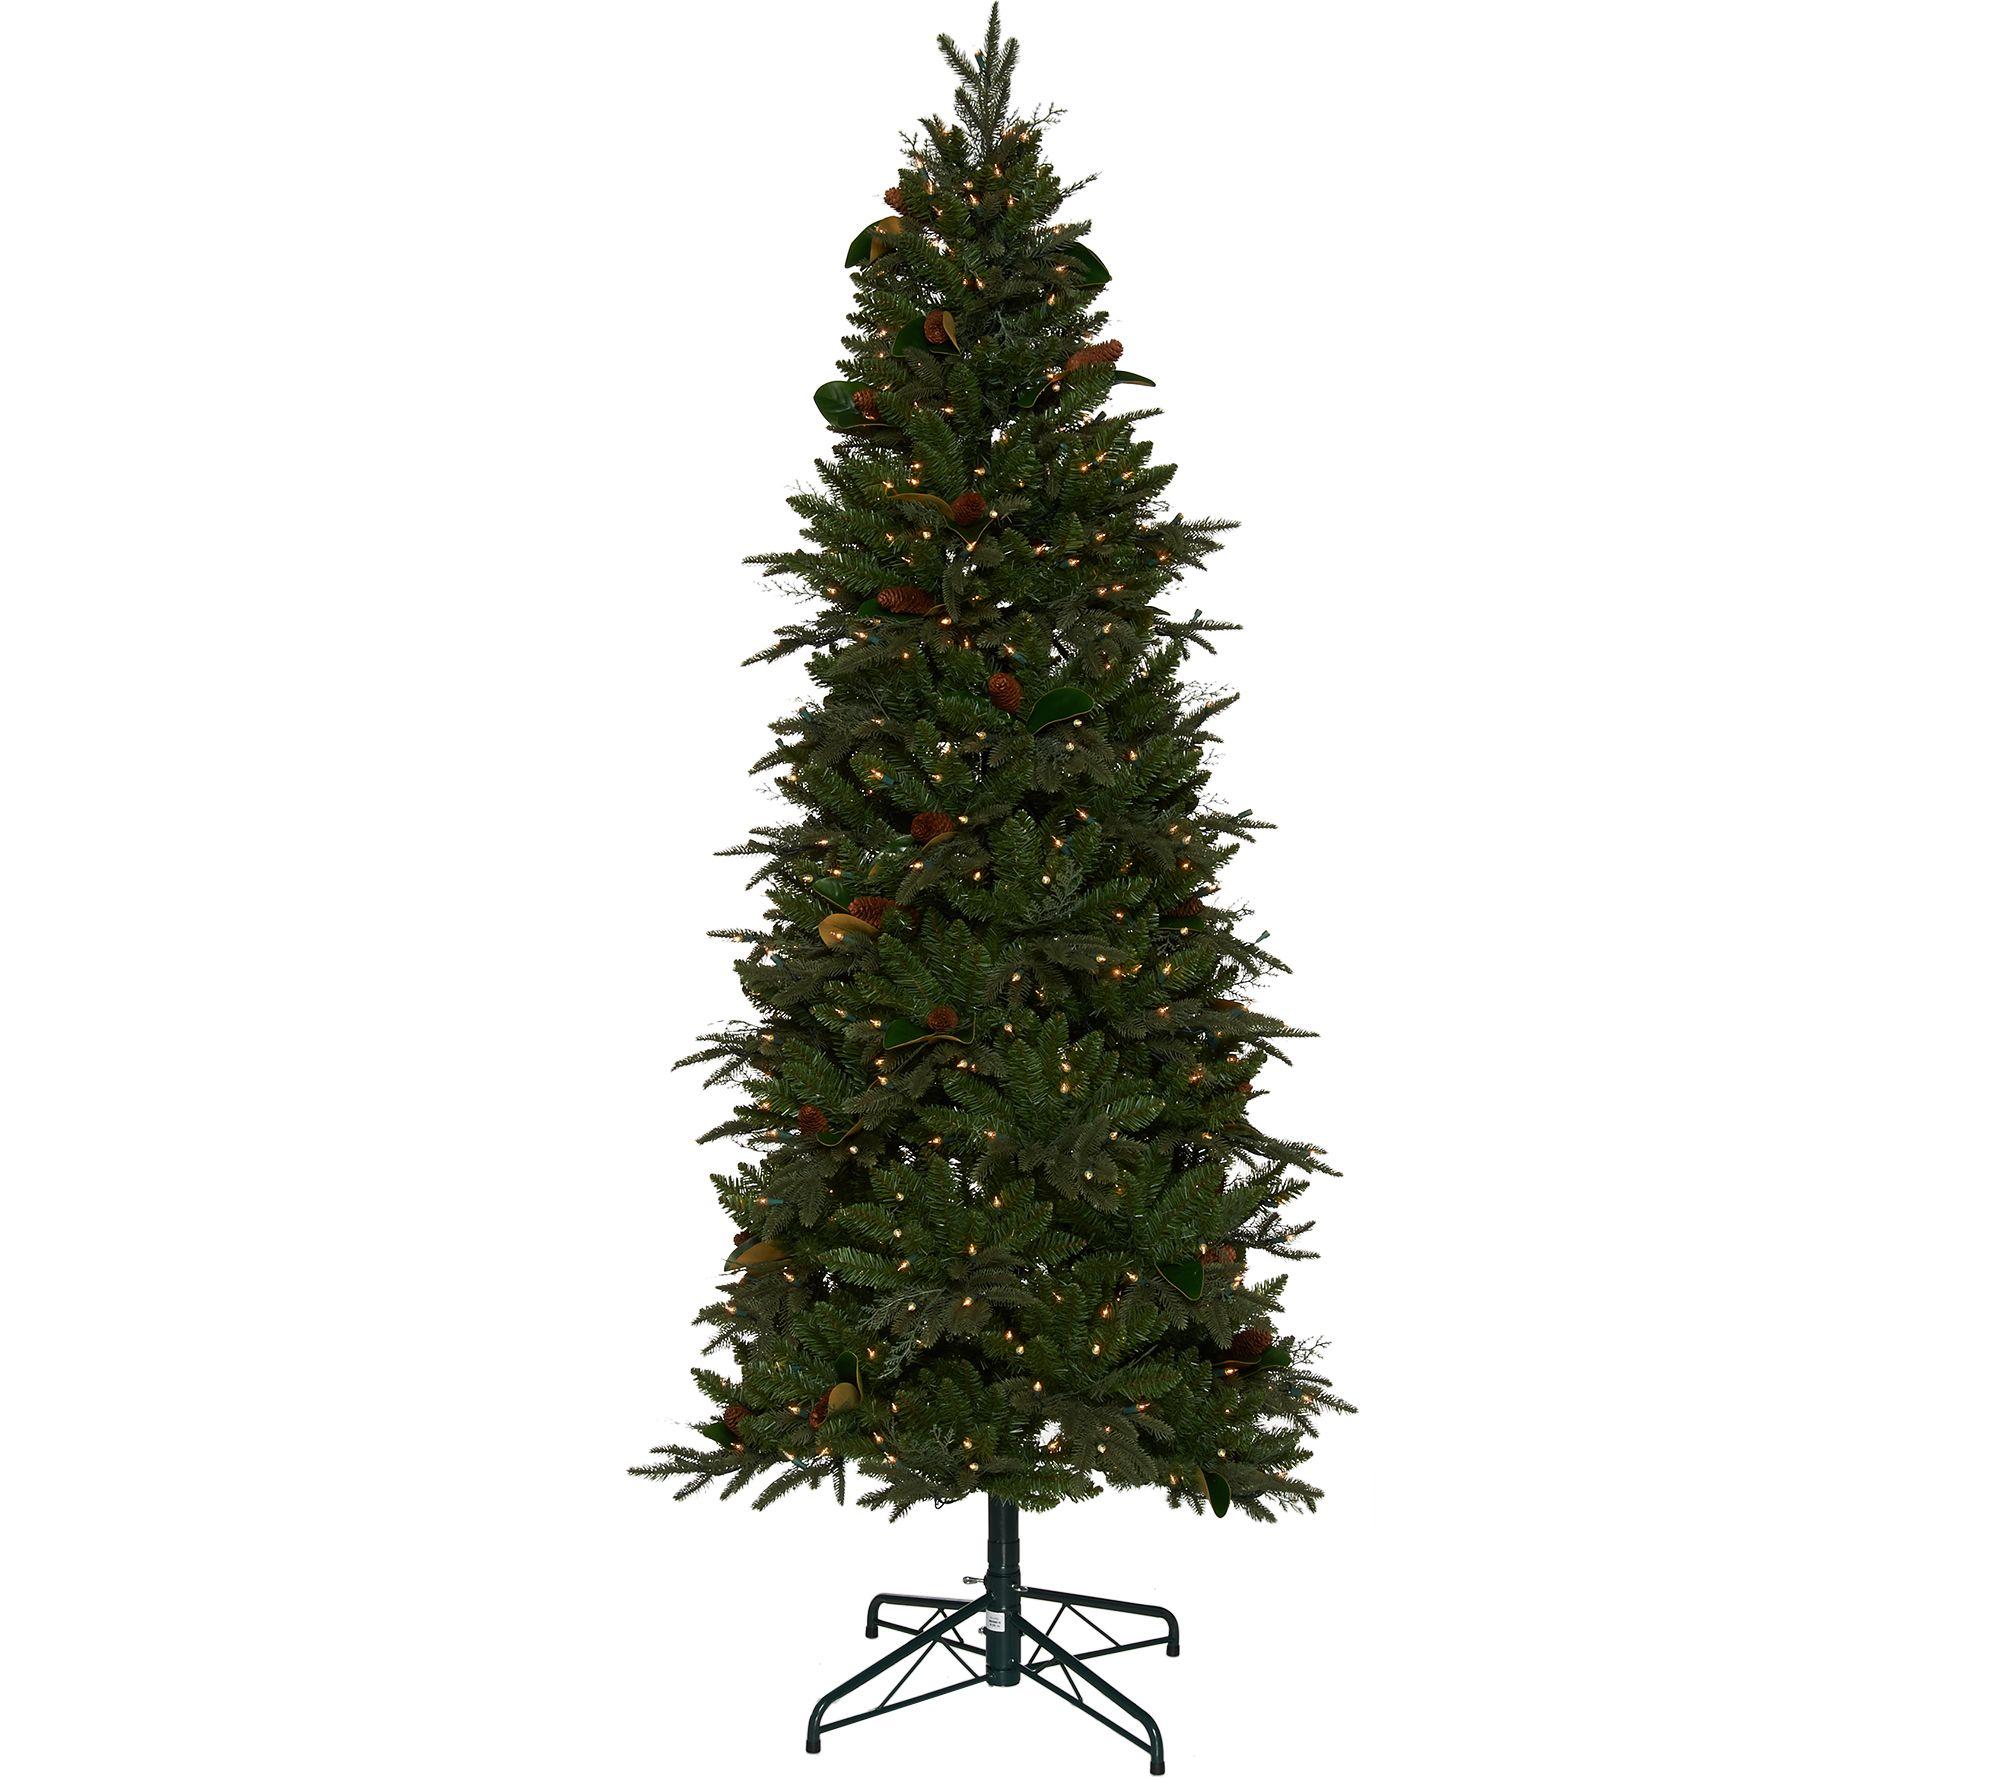 bethlehem lighting. bethlehem lights 65u0027 sitka spruce christmas tree h208503 lighting g